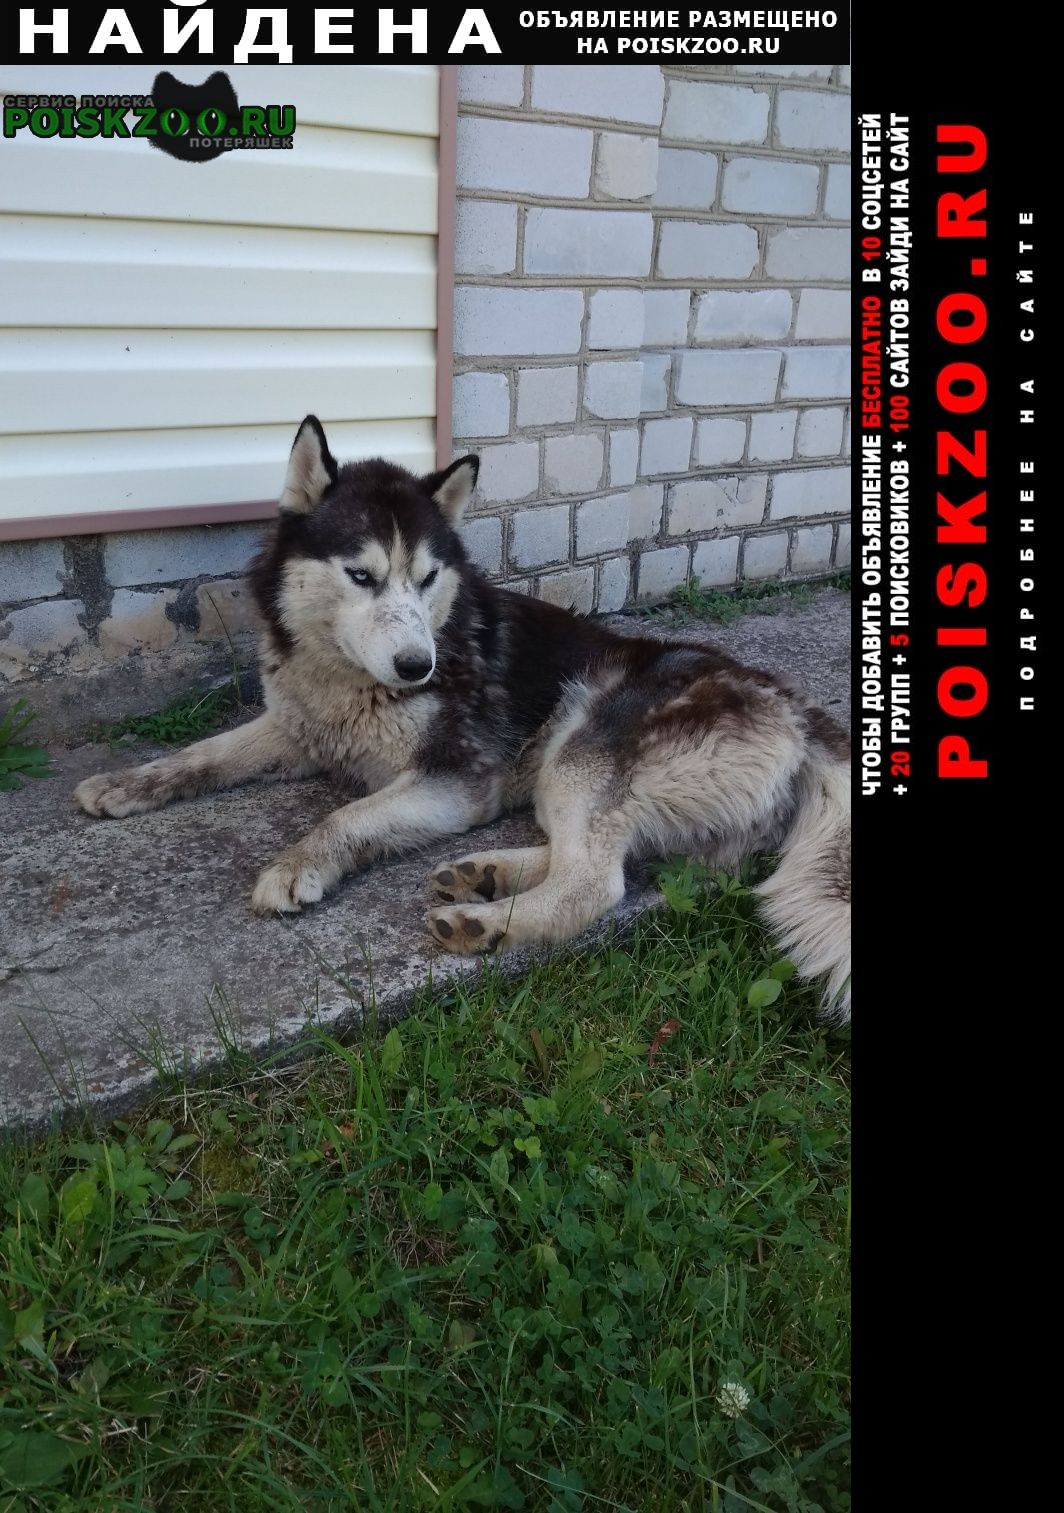 Найдена собака хаски, мальчик Нижний Новгород